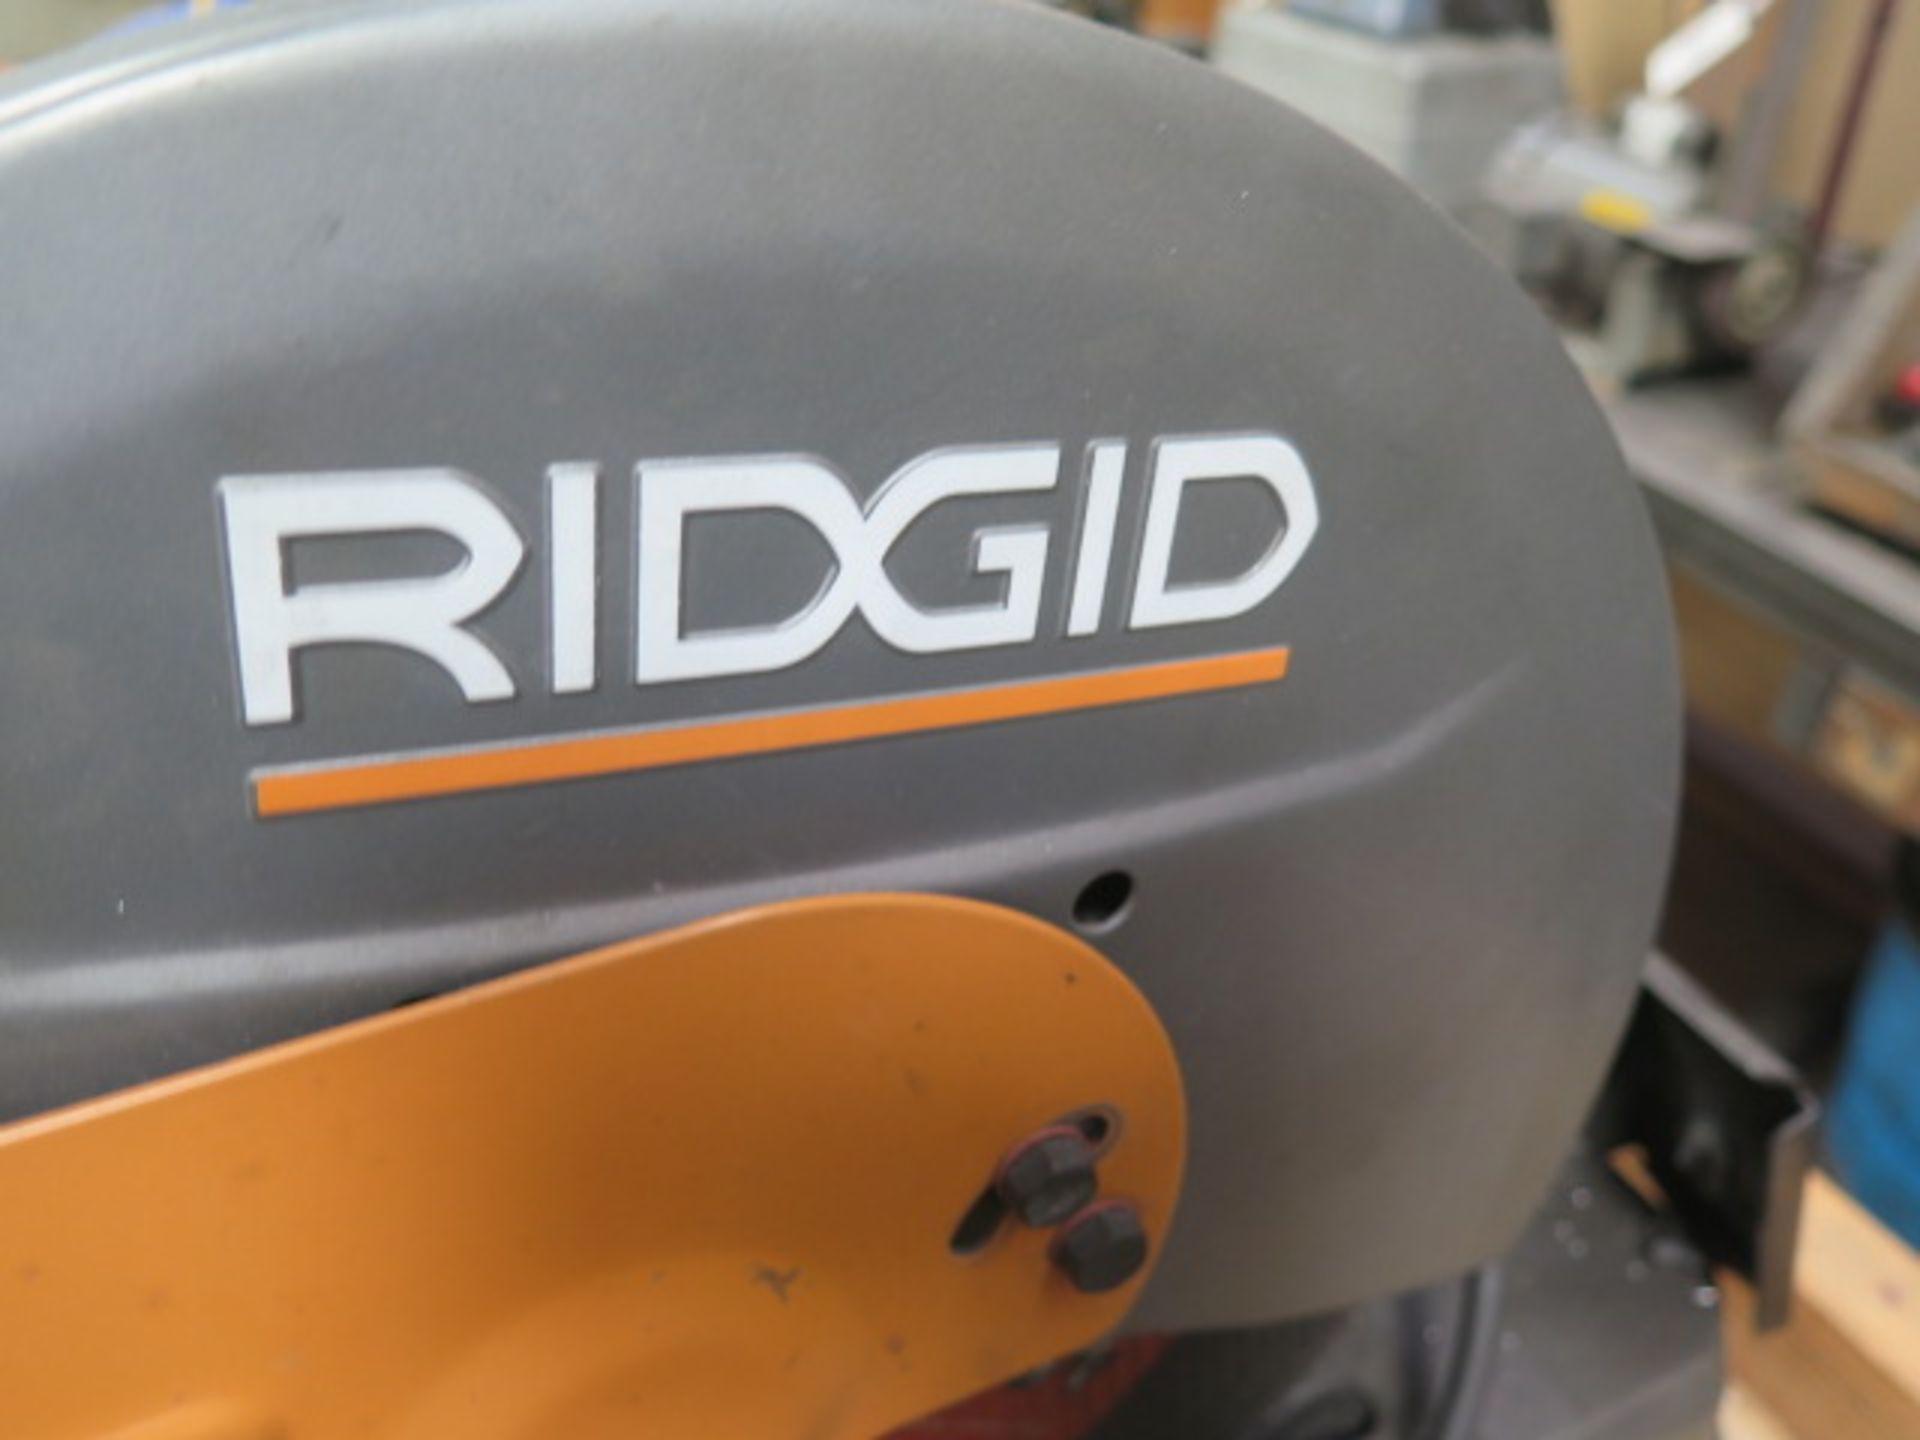 Ridgid Abrasive Cutoff Saw (SOLD AS-IS - NO WARRANTY) - Image 3 of 5